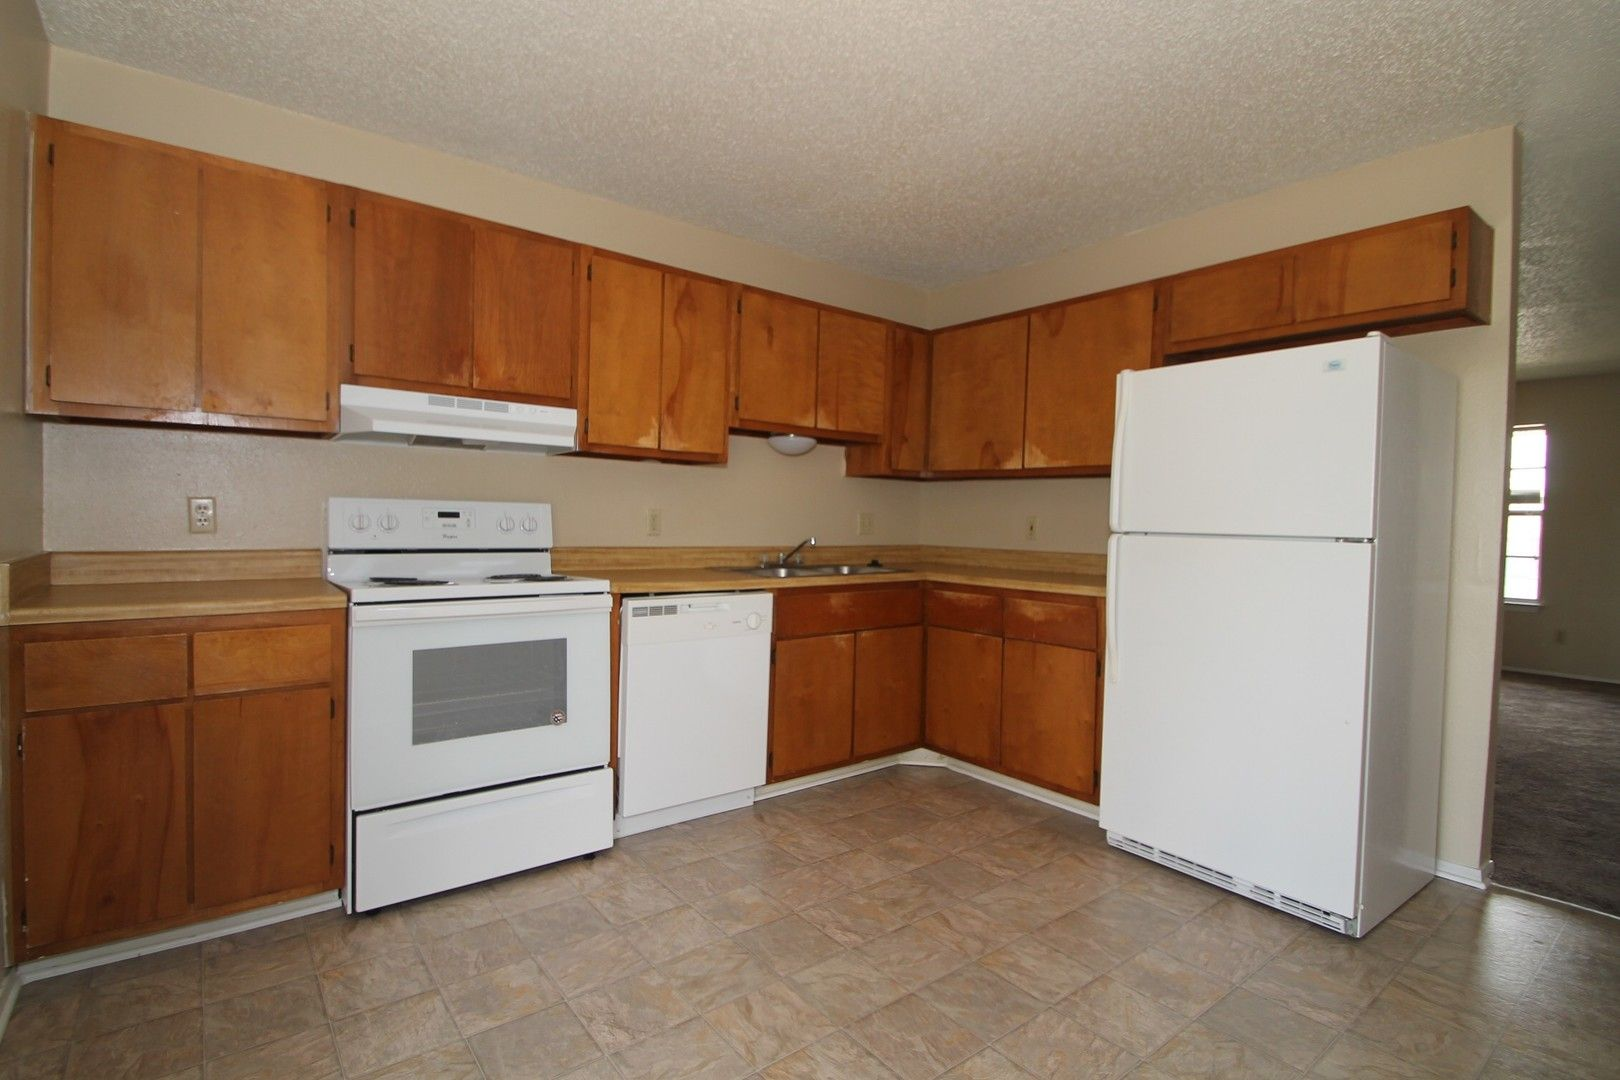 Killeen rentals contact at 254 6343311 or visit